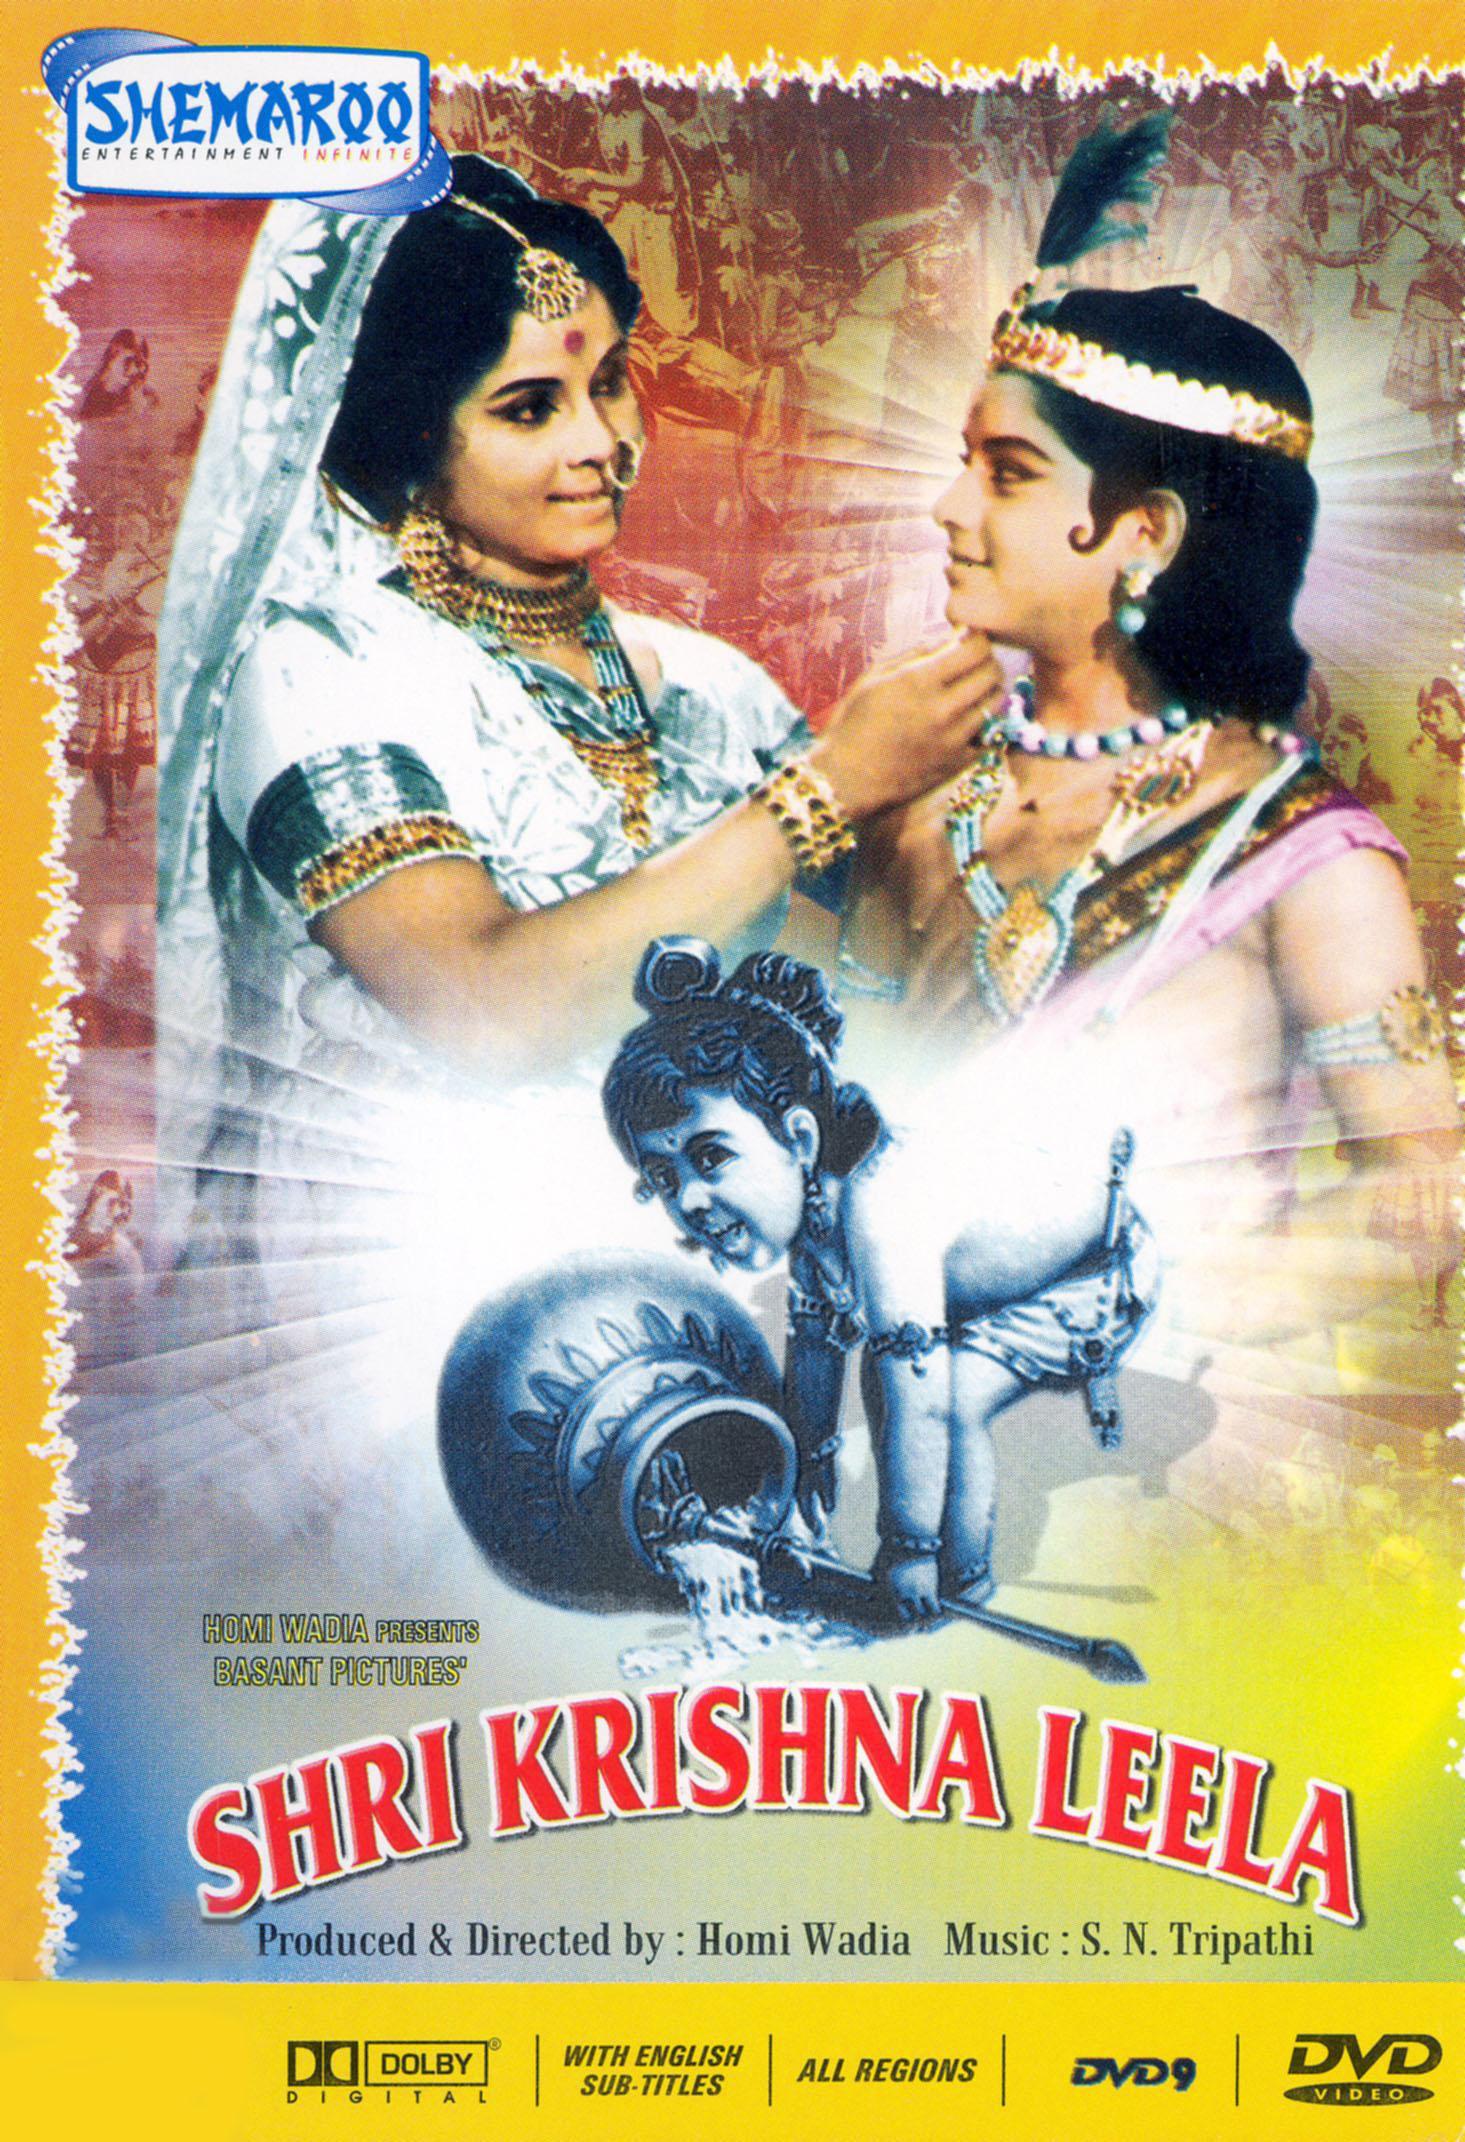 Shri movie